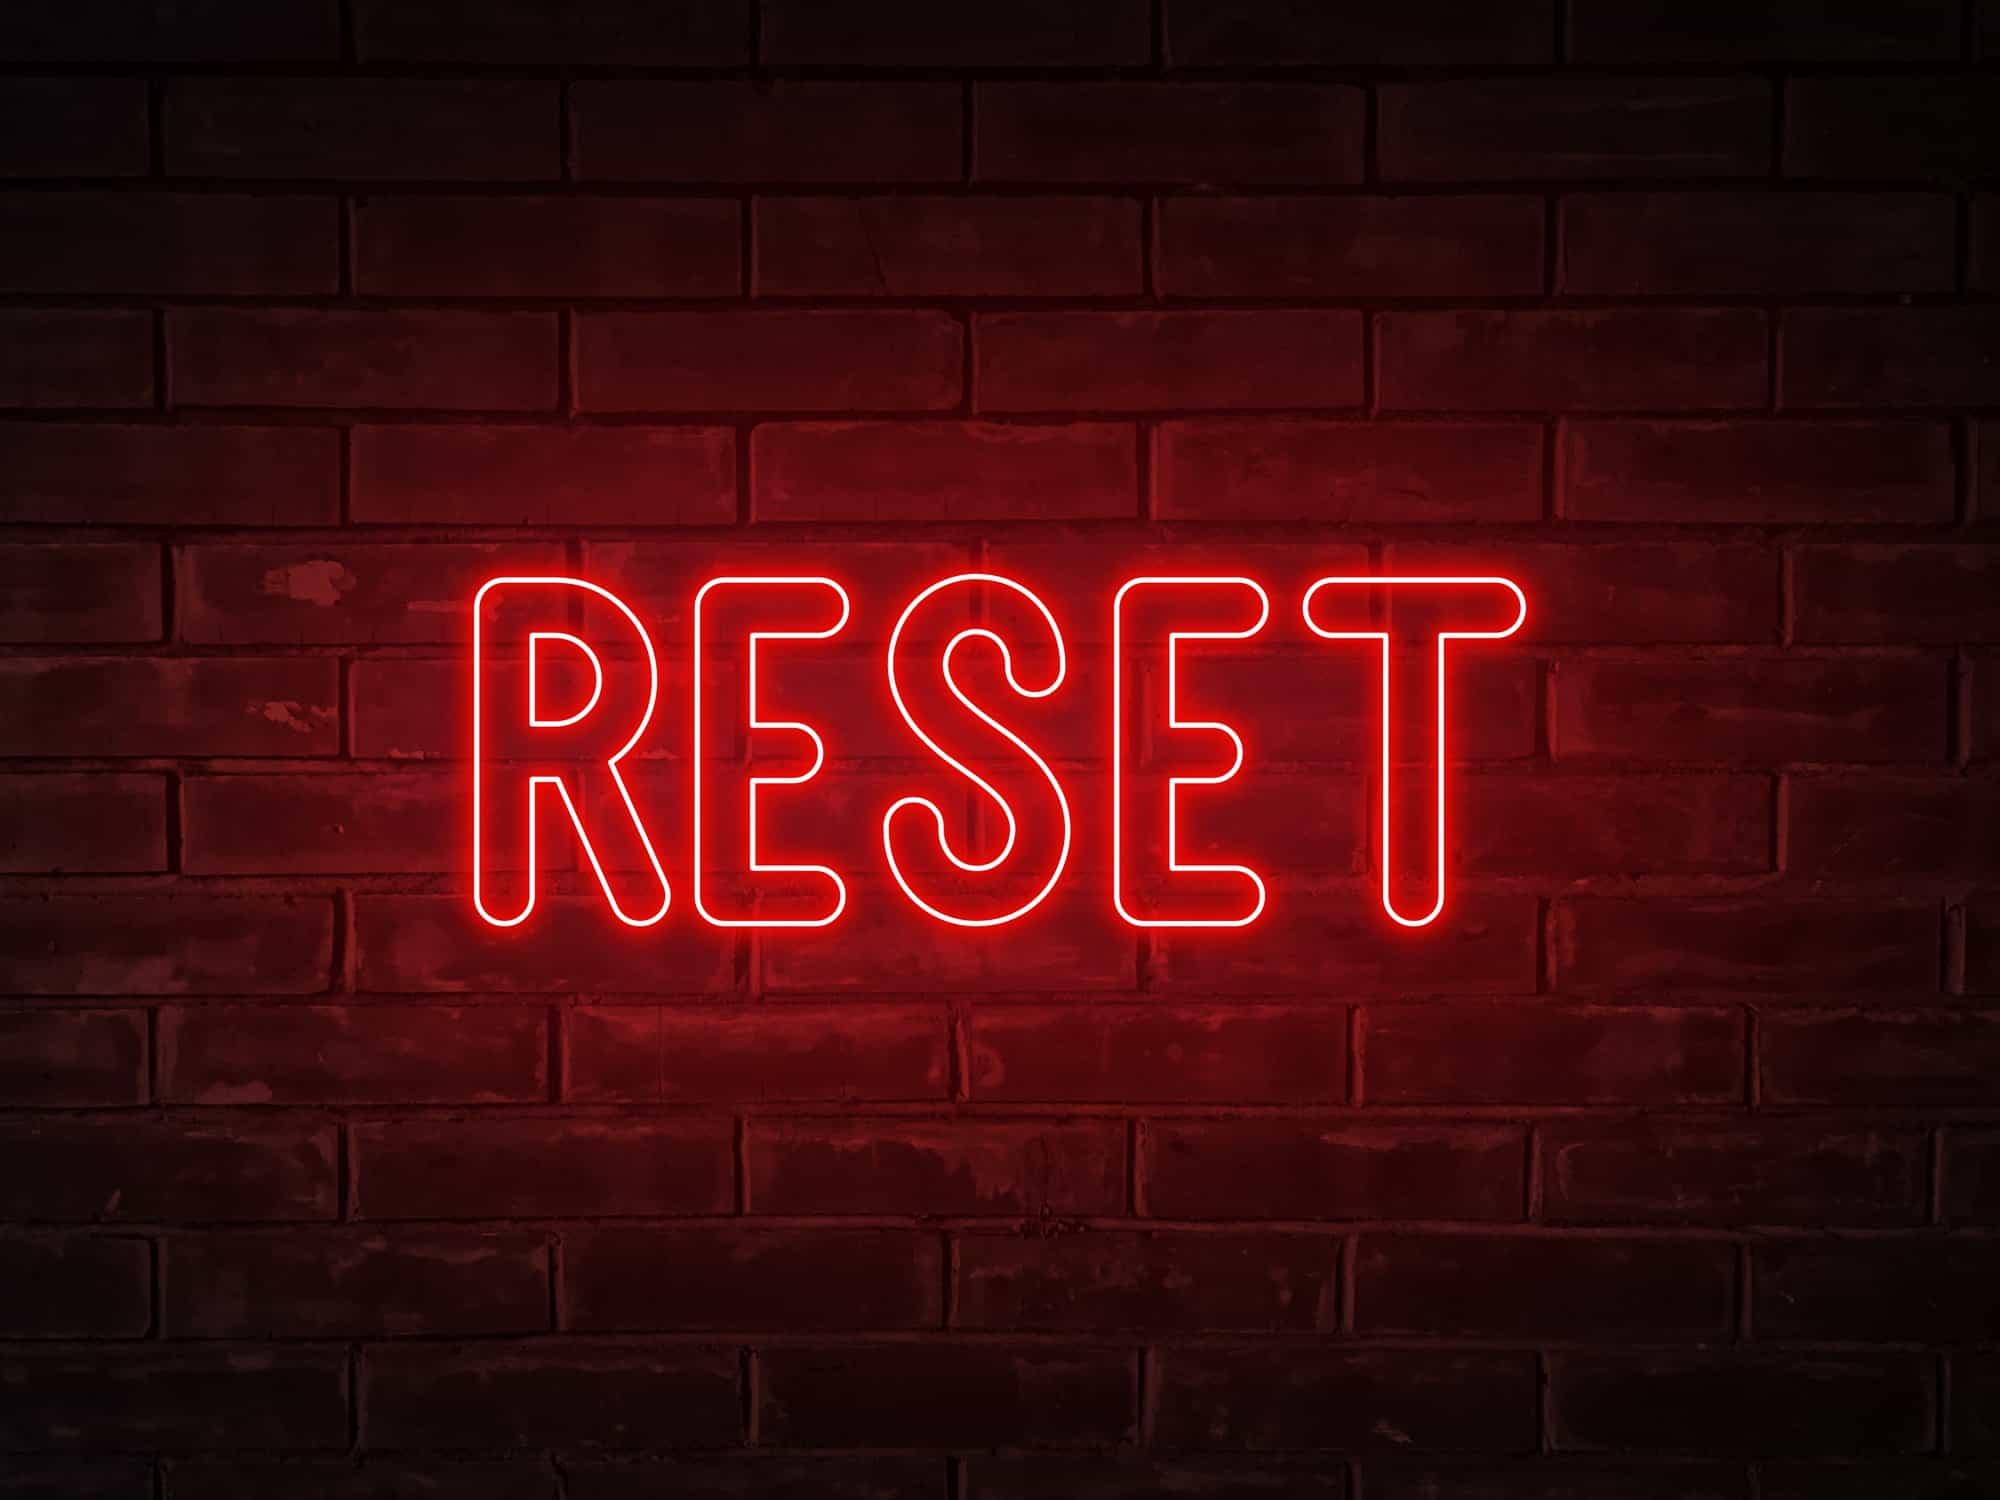 Reset - neon light word on brick wall background